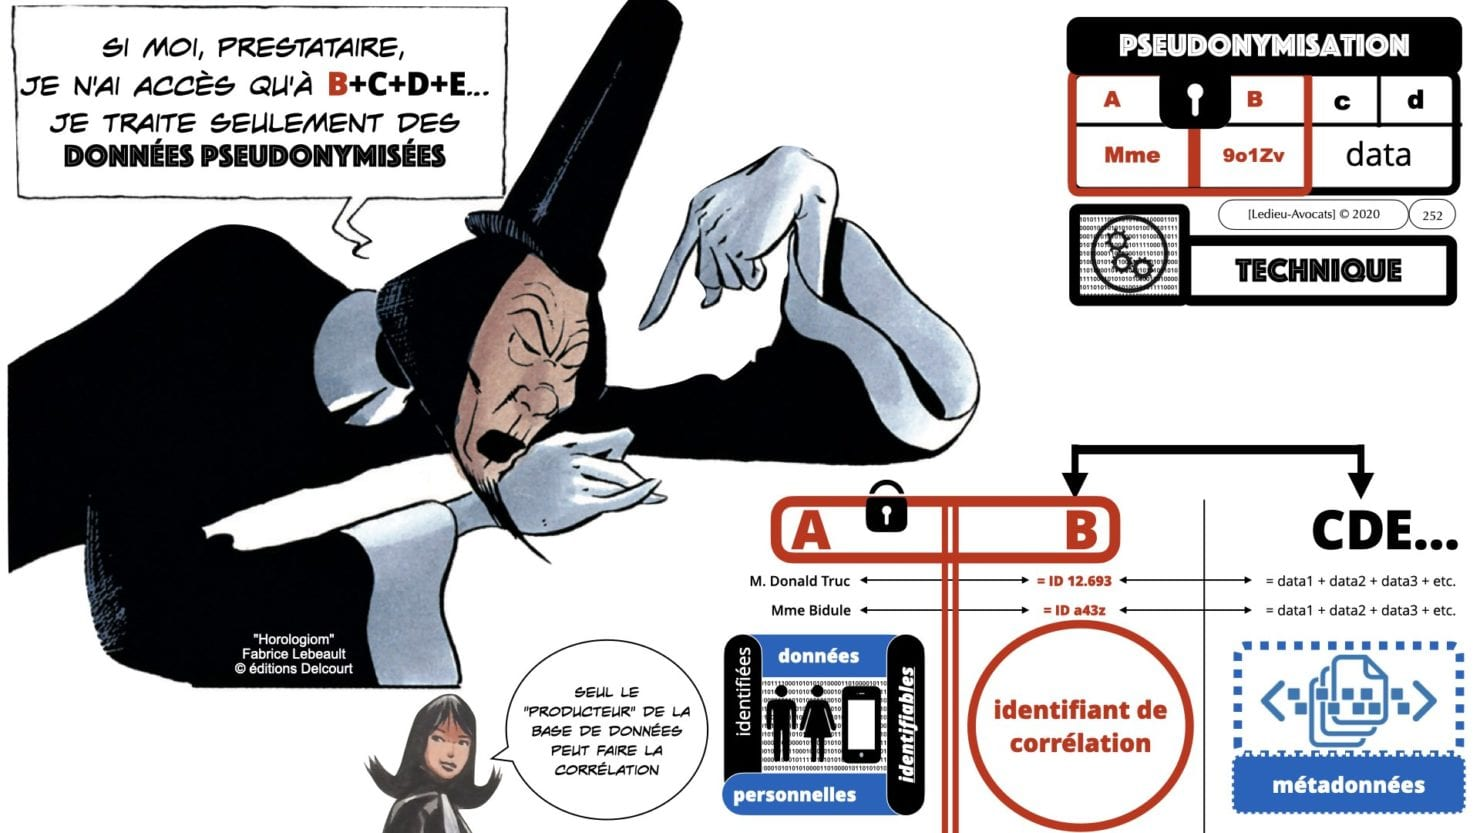 RGPD e-Privacy principes actualité jurisprudence ©Ledieu-Avocats 25-06-2021.252